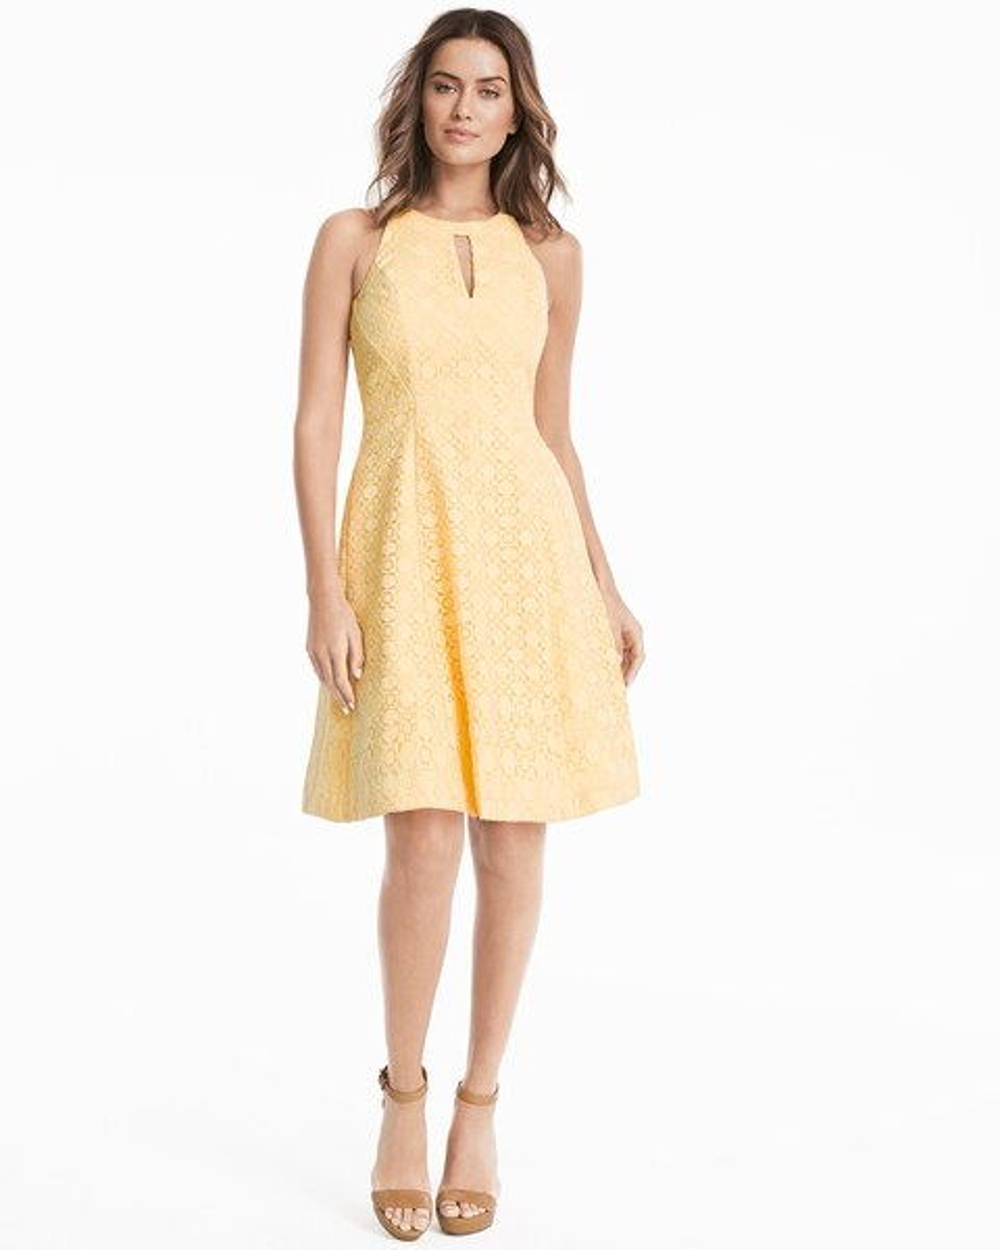 9132e83b307 Lace Halter A-line Dress - White House Black Market